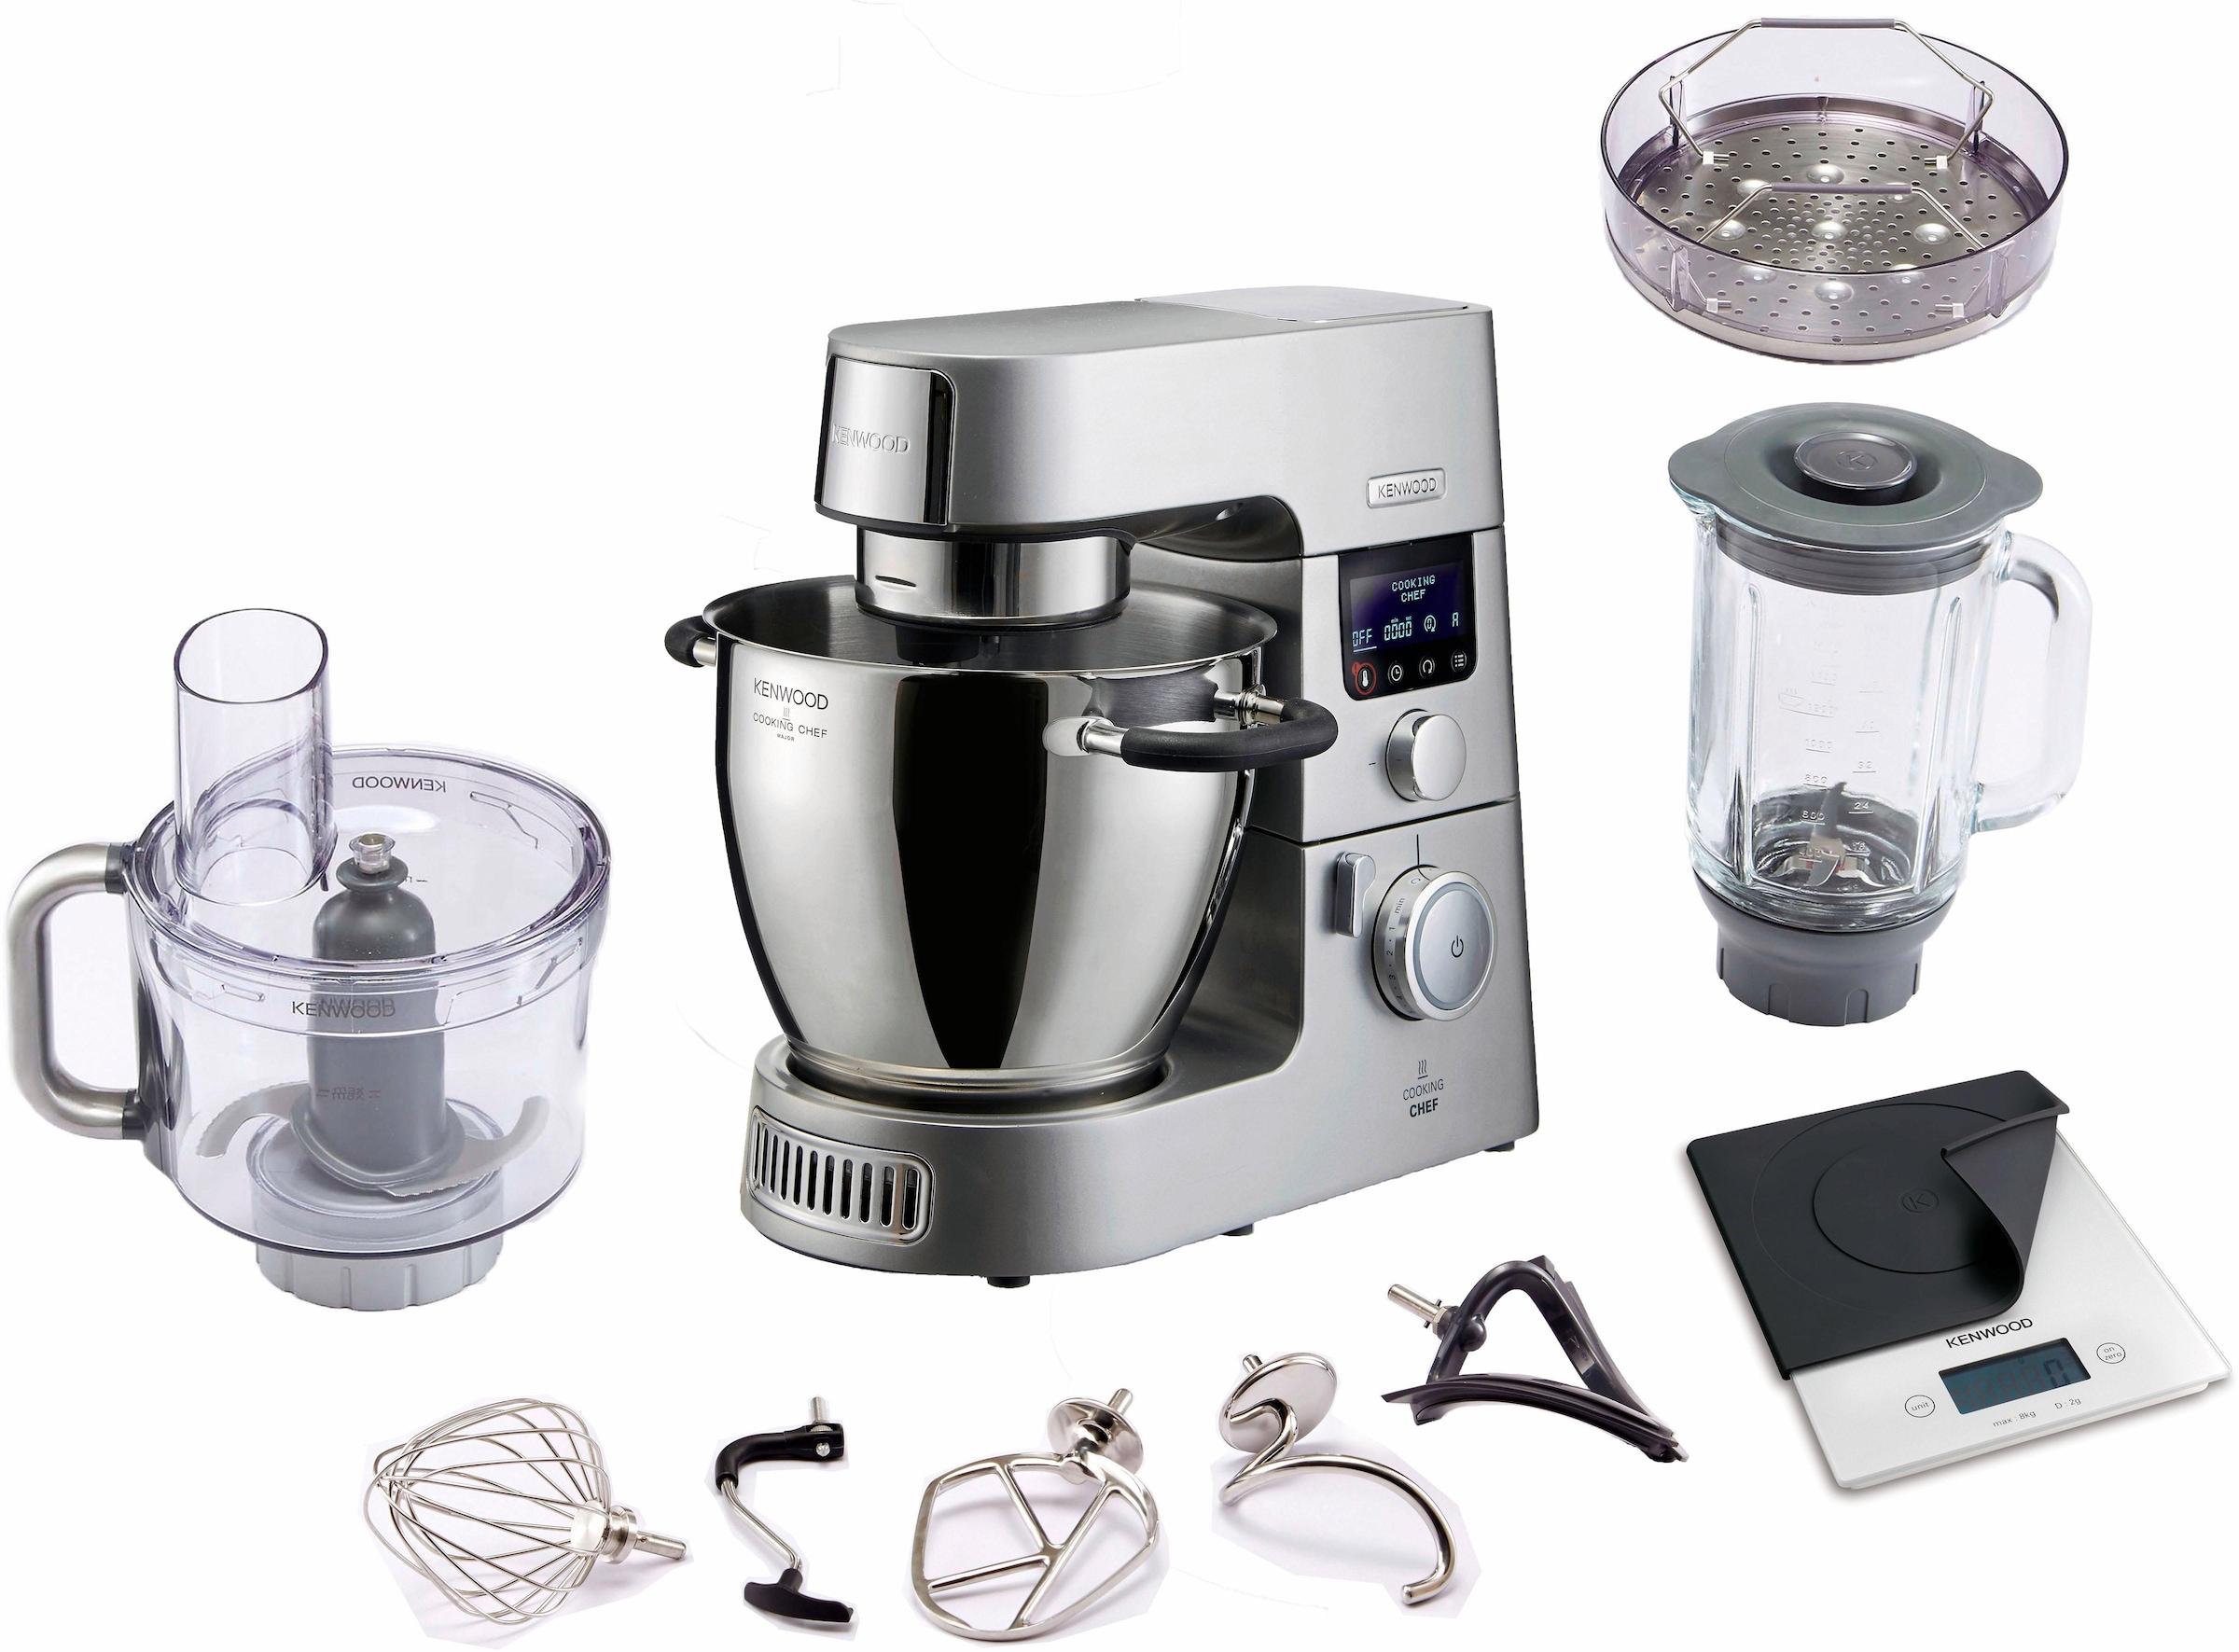 Wmf Elektrogrill Ersatzteile : Wmf kult küchenmaschine ersatzteile: wmf küchenmaschine profi plus